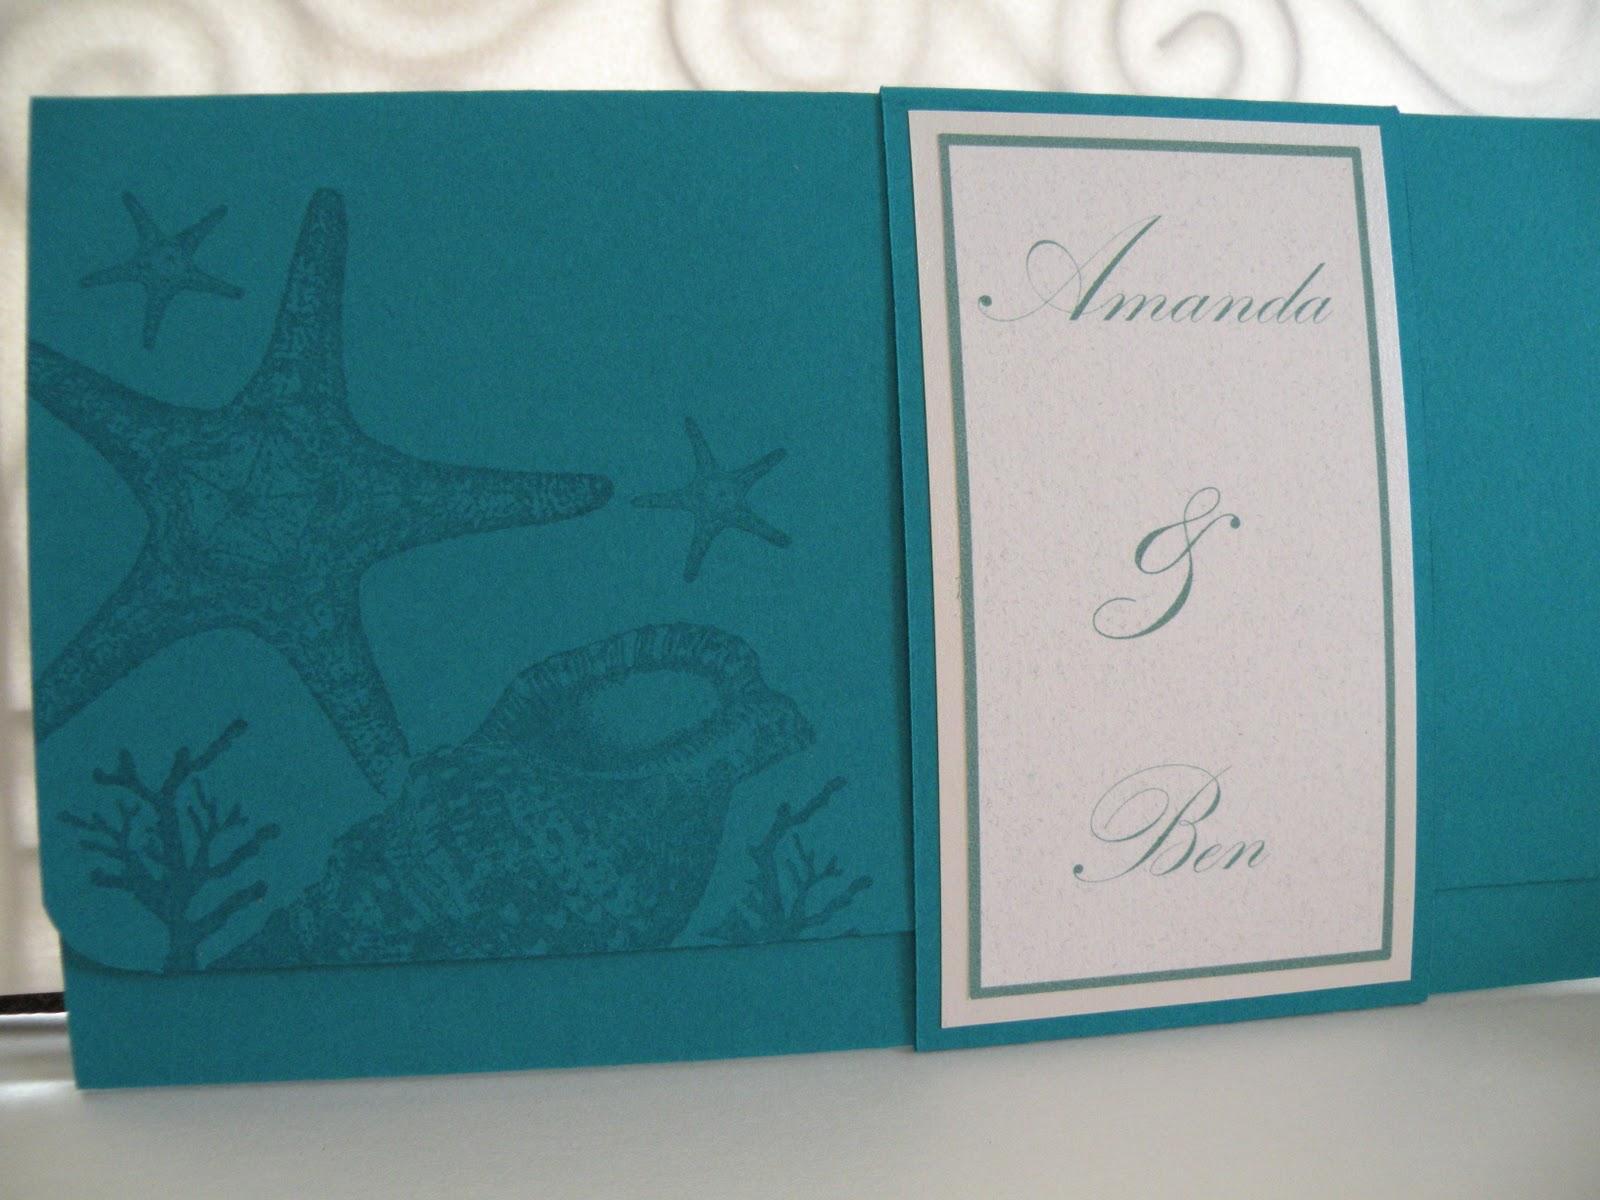 informal diego groom groomsmen chosen wedding invitations beach theme Kaashifa s blog